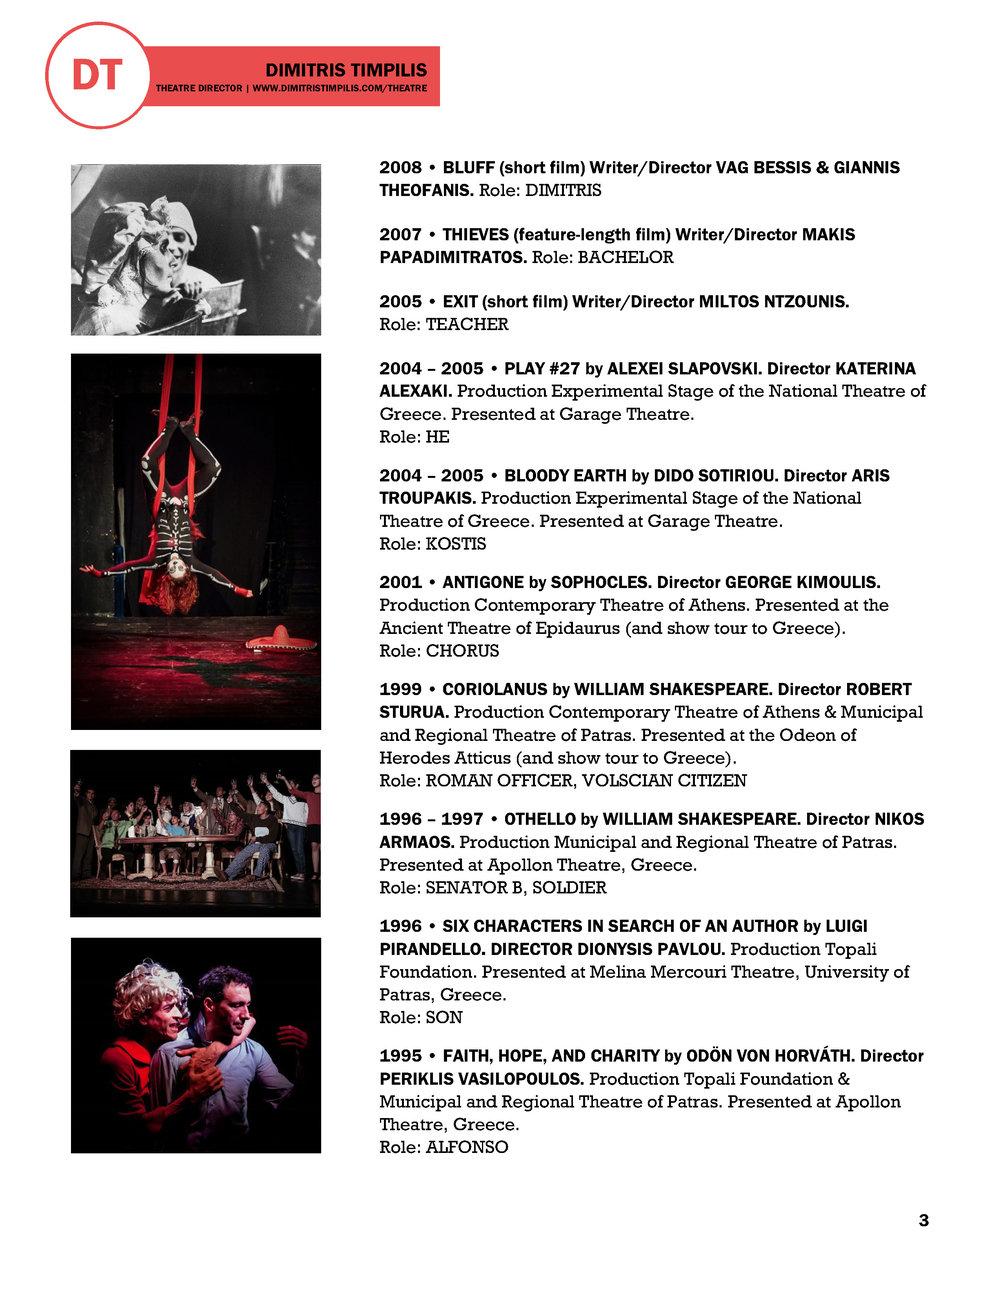 Dimitris Timpilis CV Theatre Director (2018)_Page_3.jpg